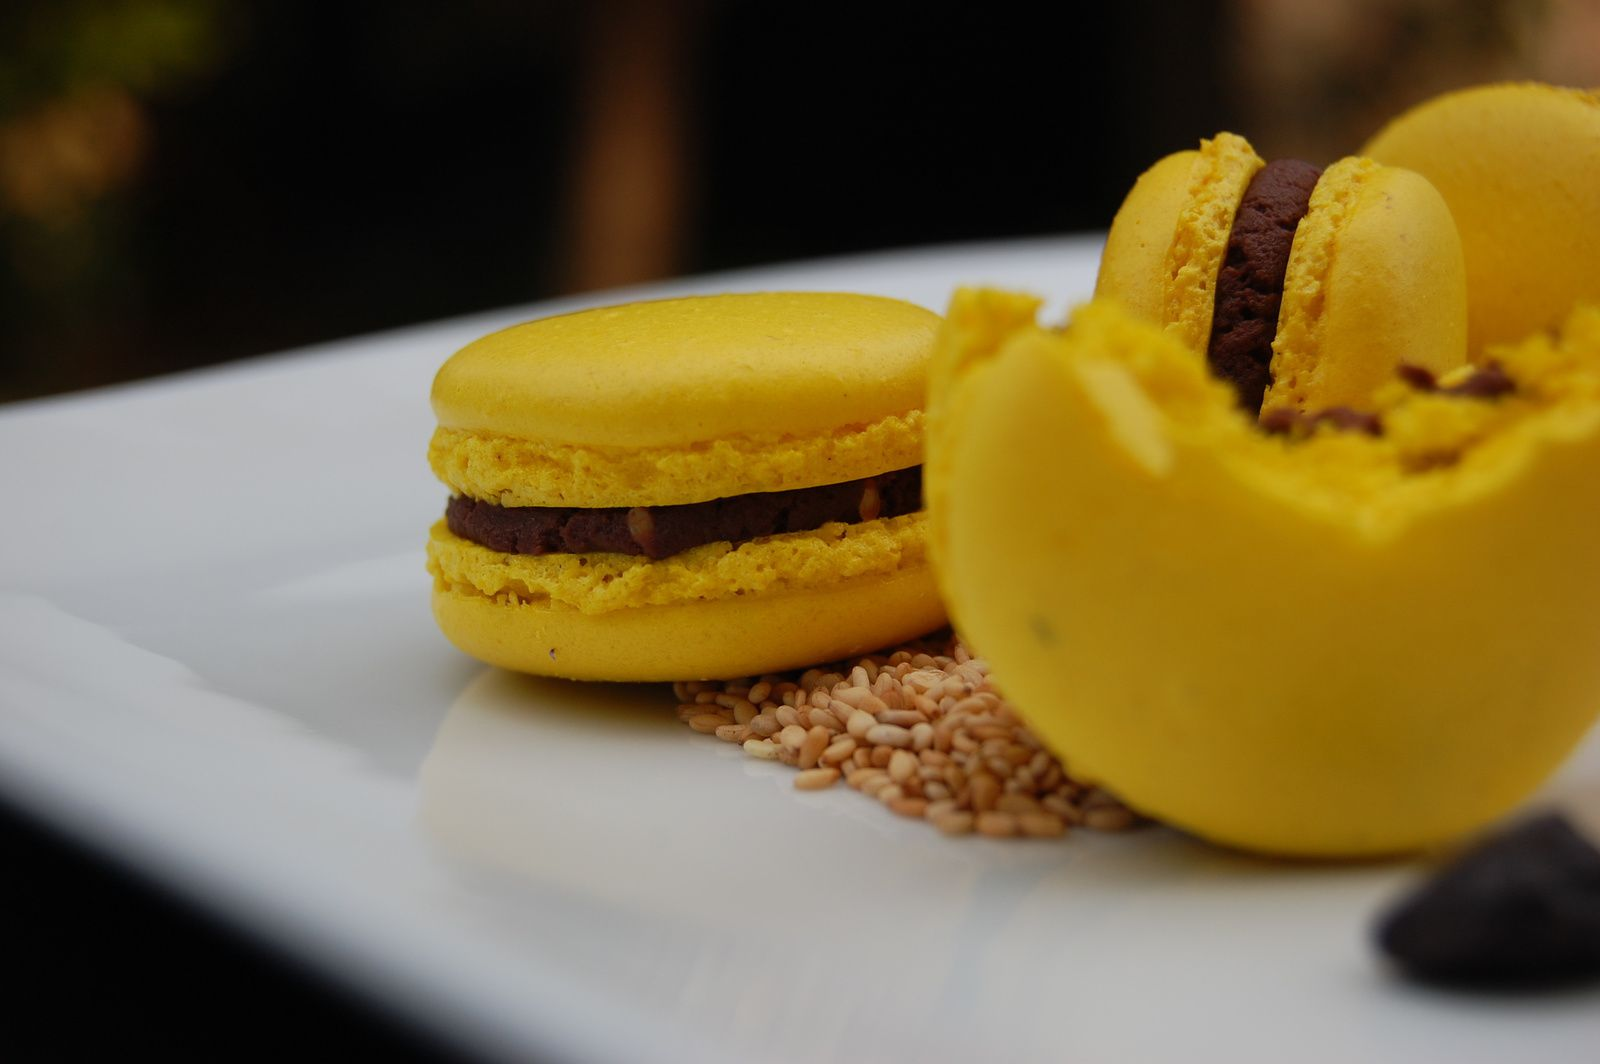 MACARONS GANACHE CHOCOLAT NOIR TONKA ET SESAME GRILLE